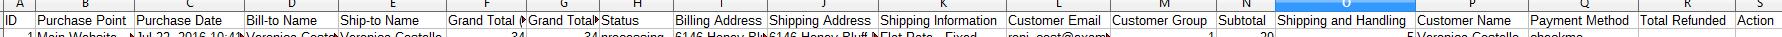 magento export orders.png